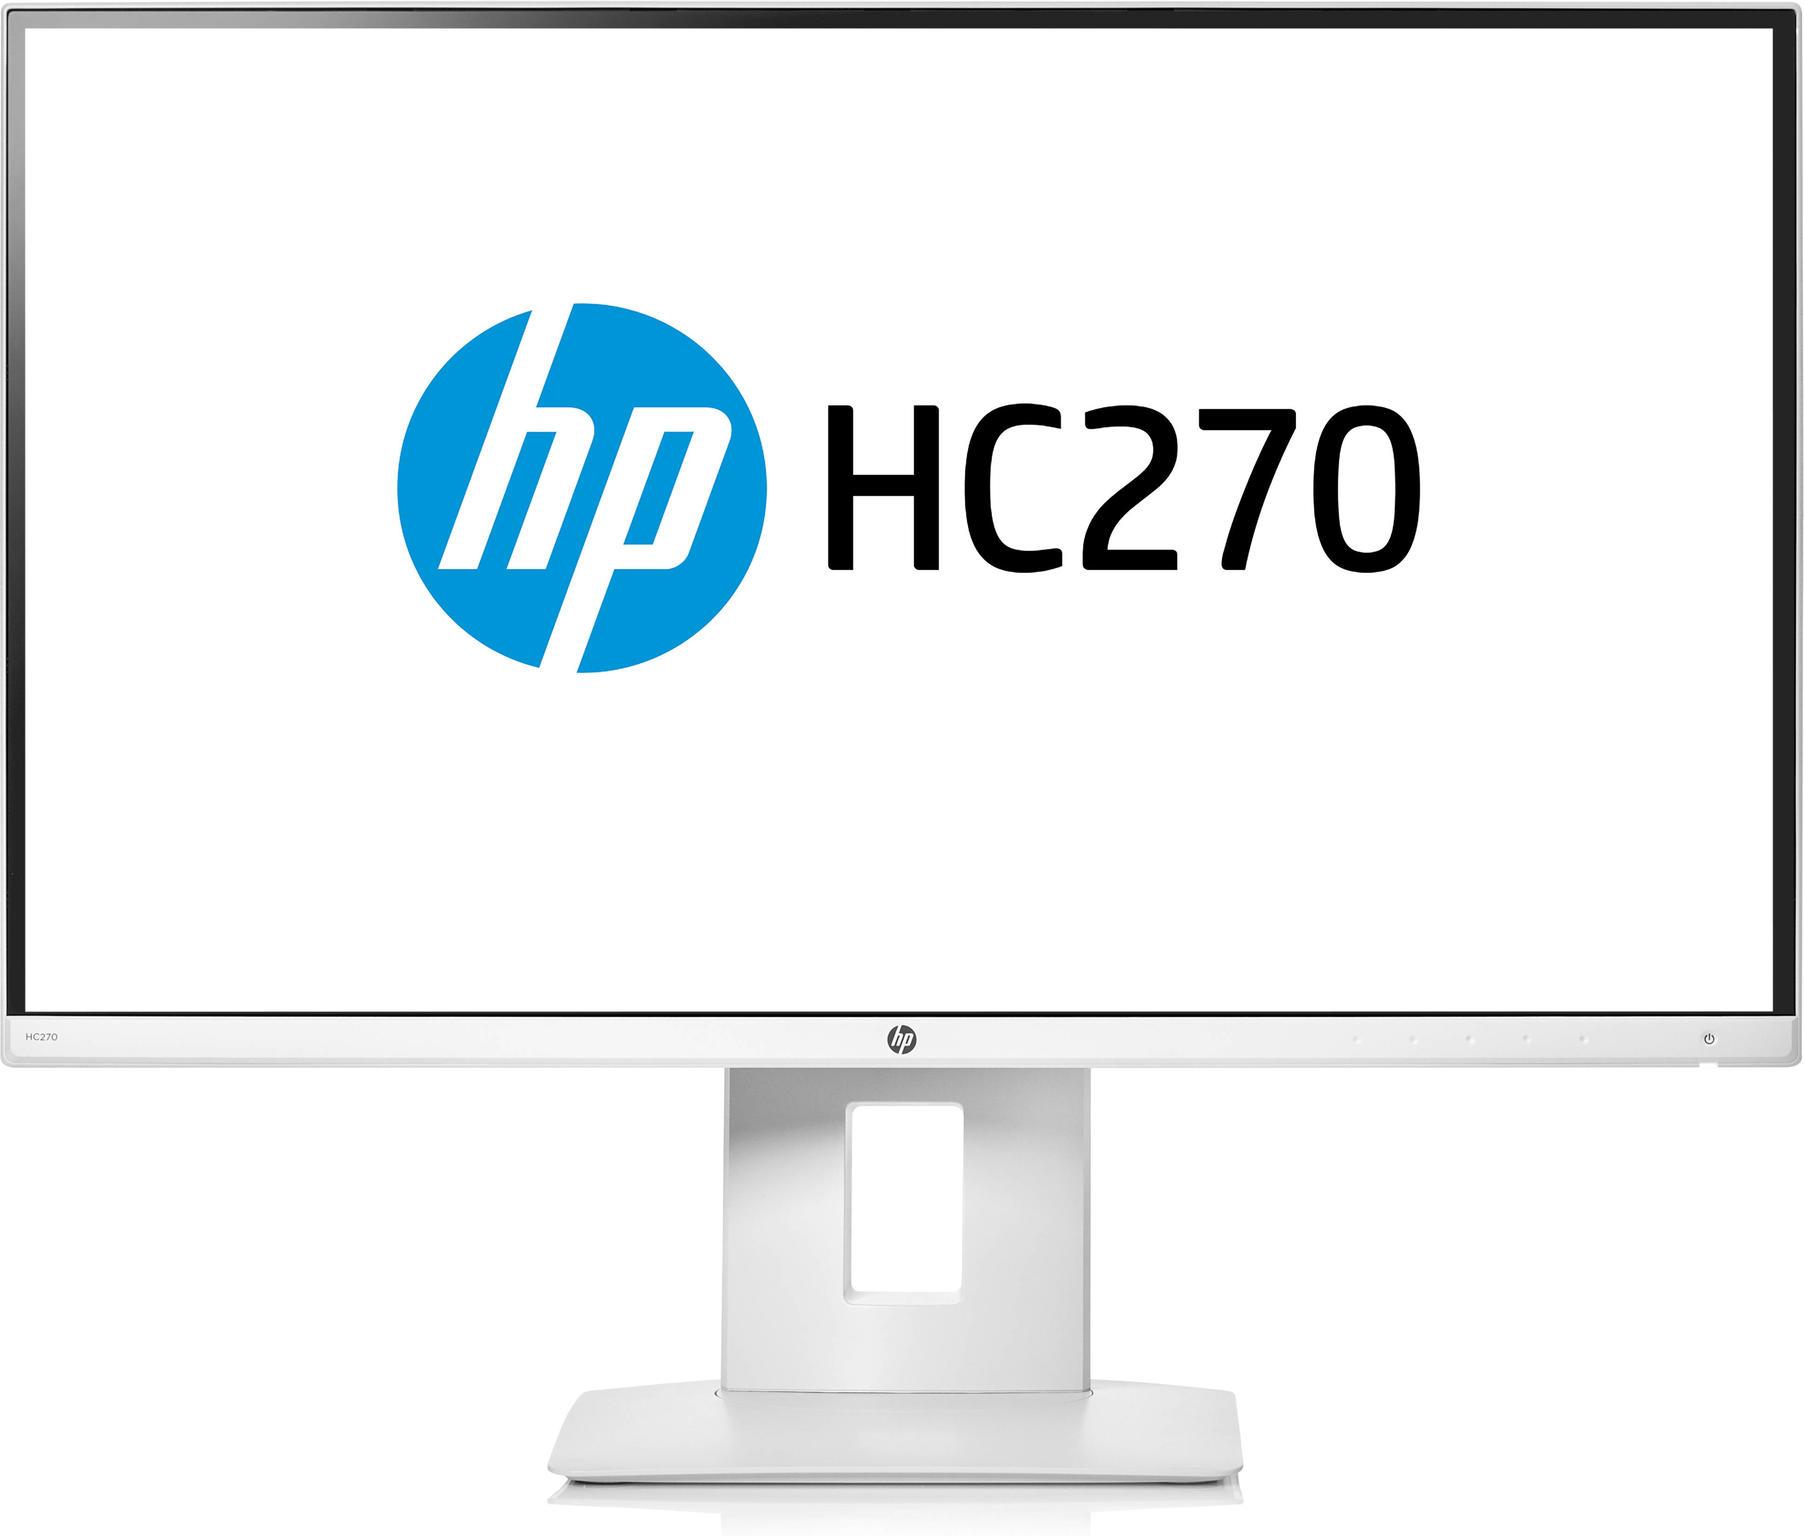 HP HC270 Healthcare edition